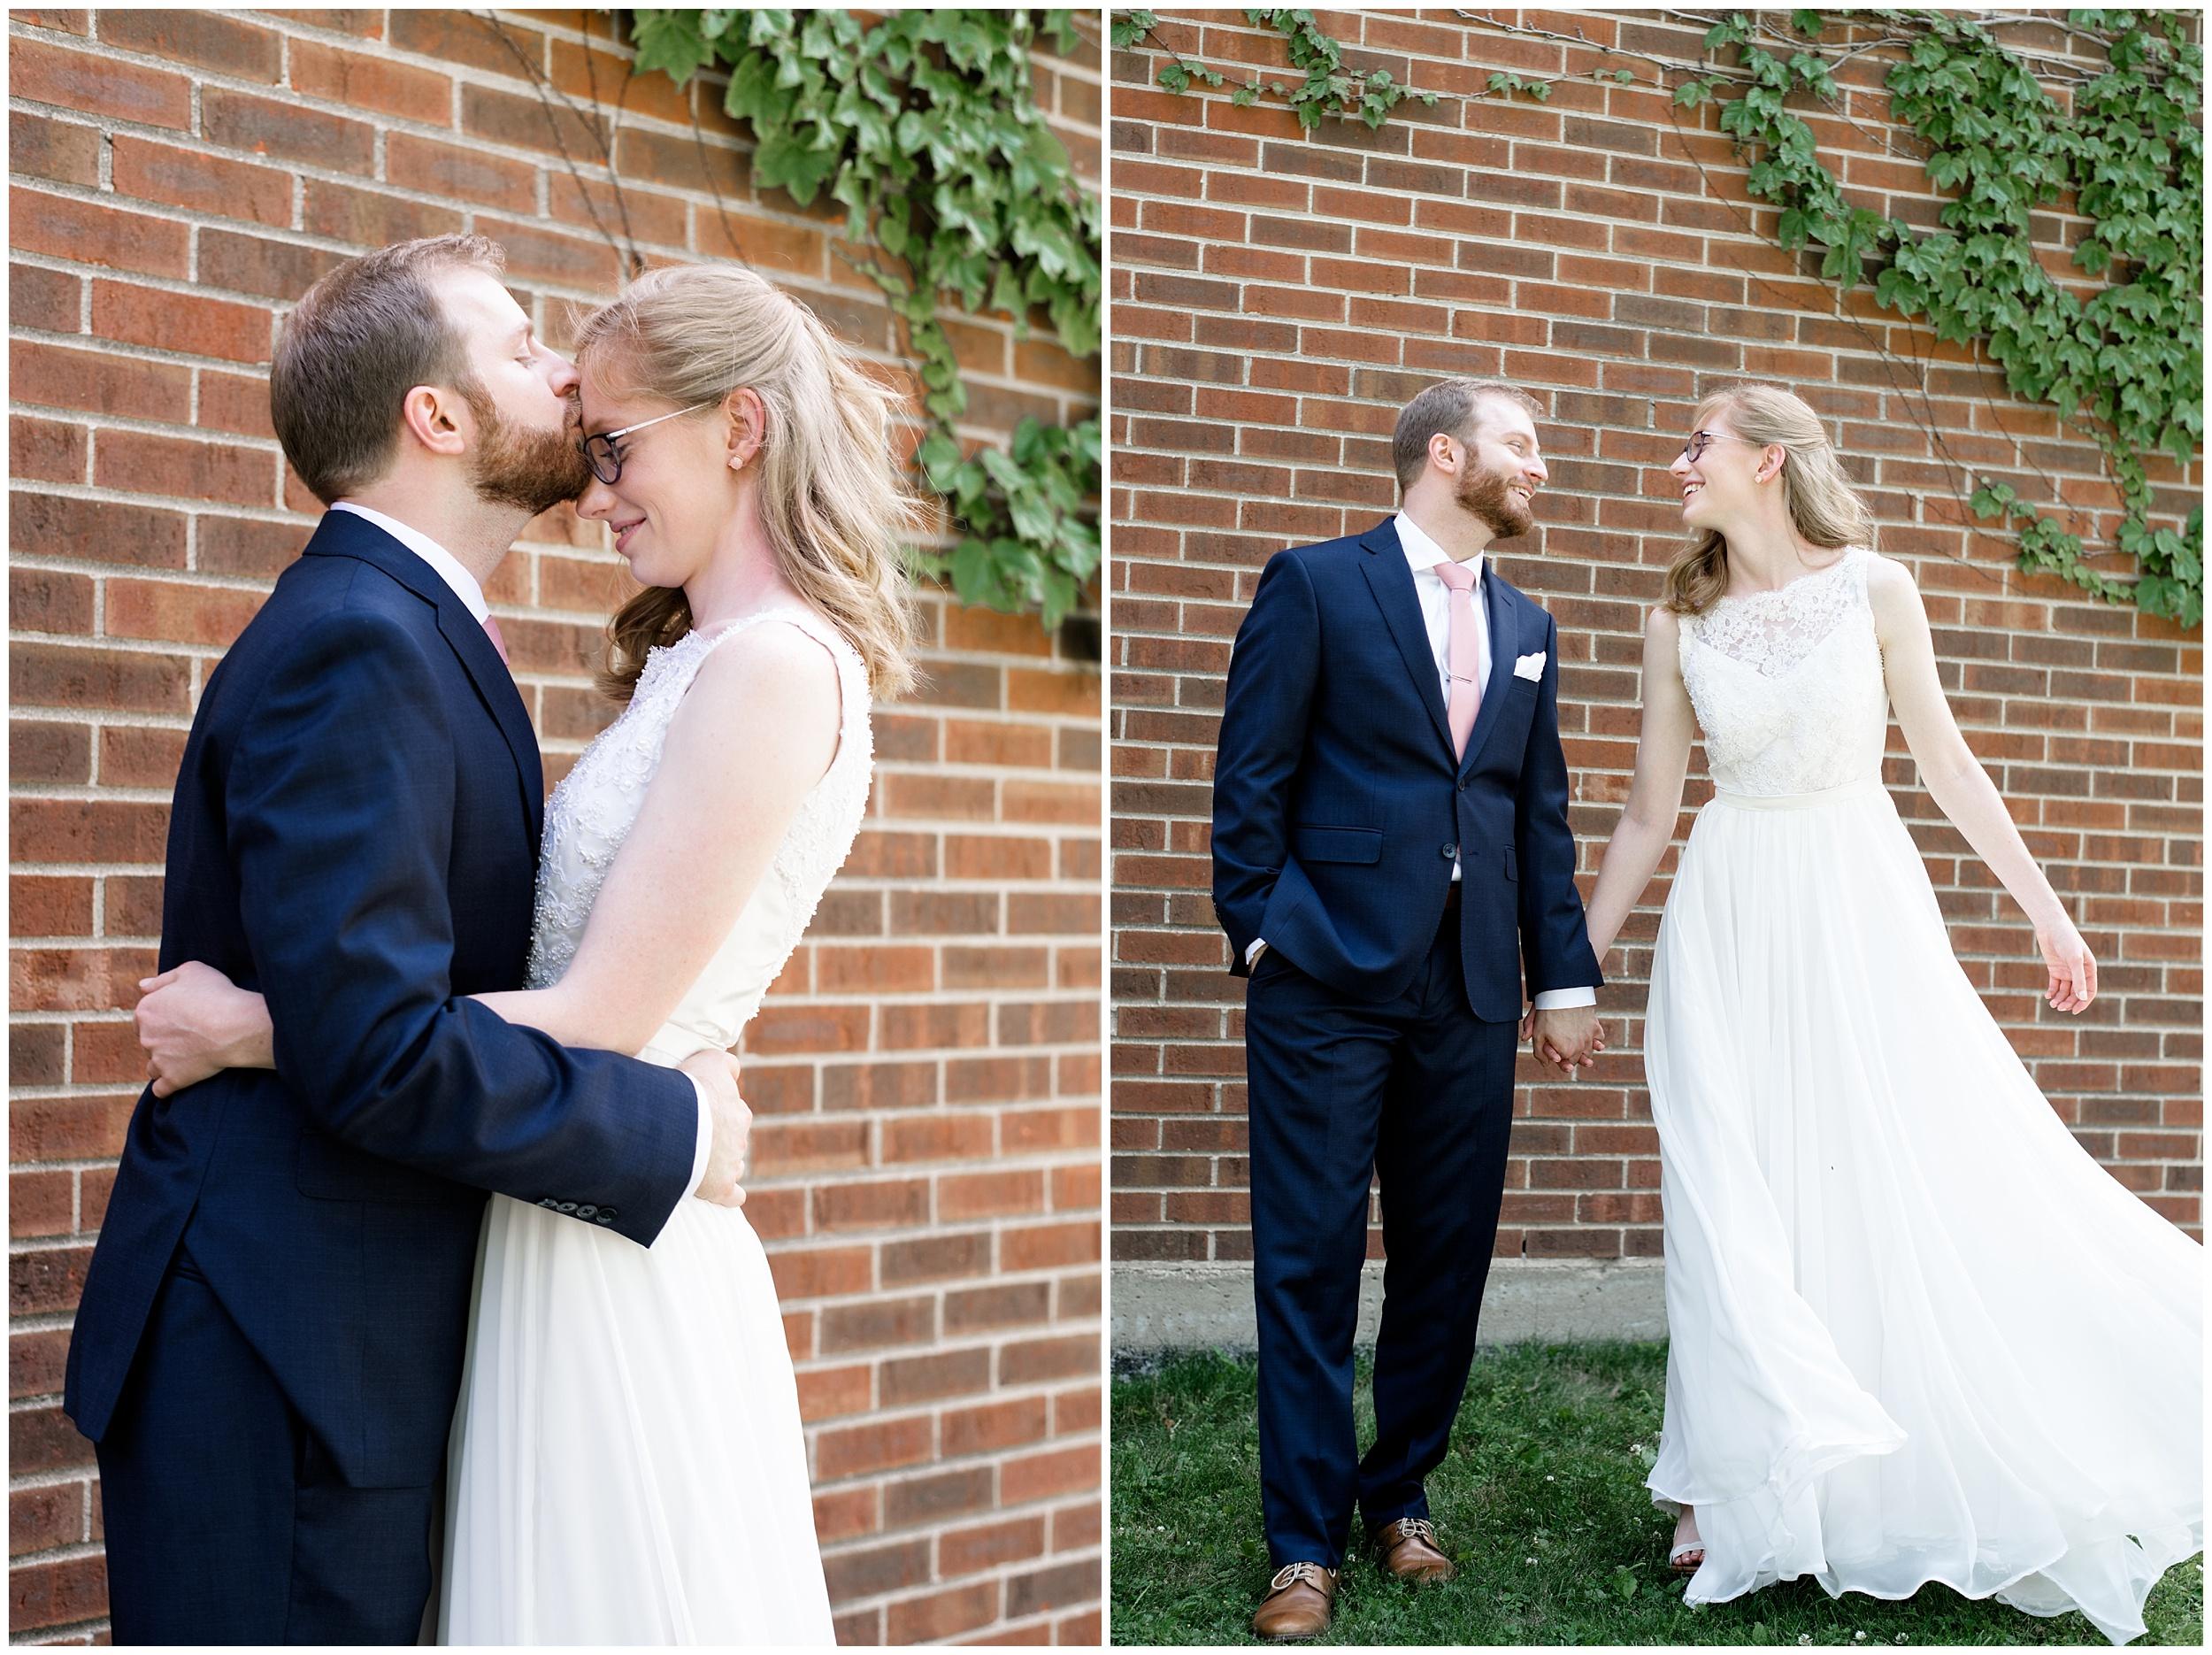 highland-park-community-house-wedding-chicago-wisconsin-photographer_0030.jpg